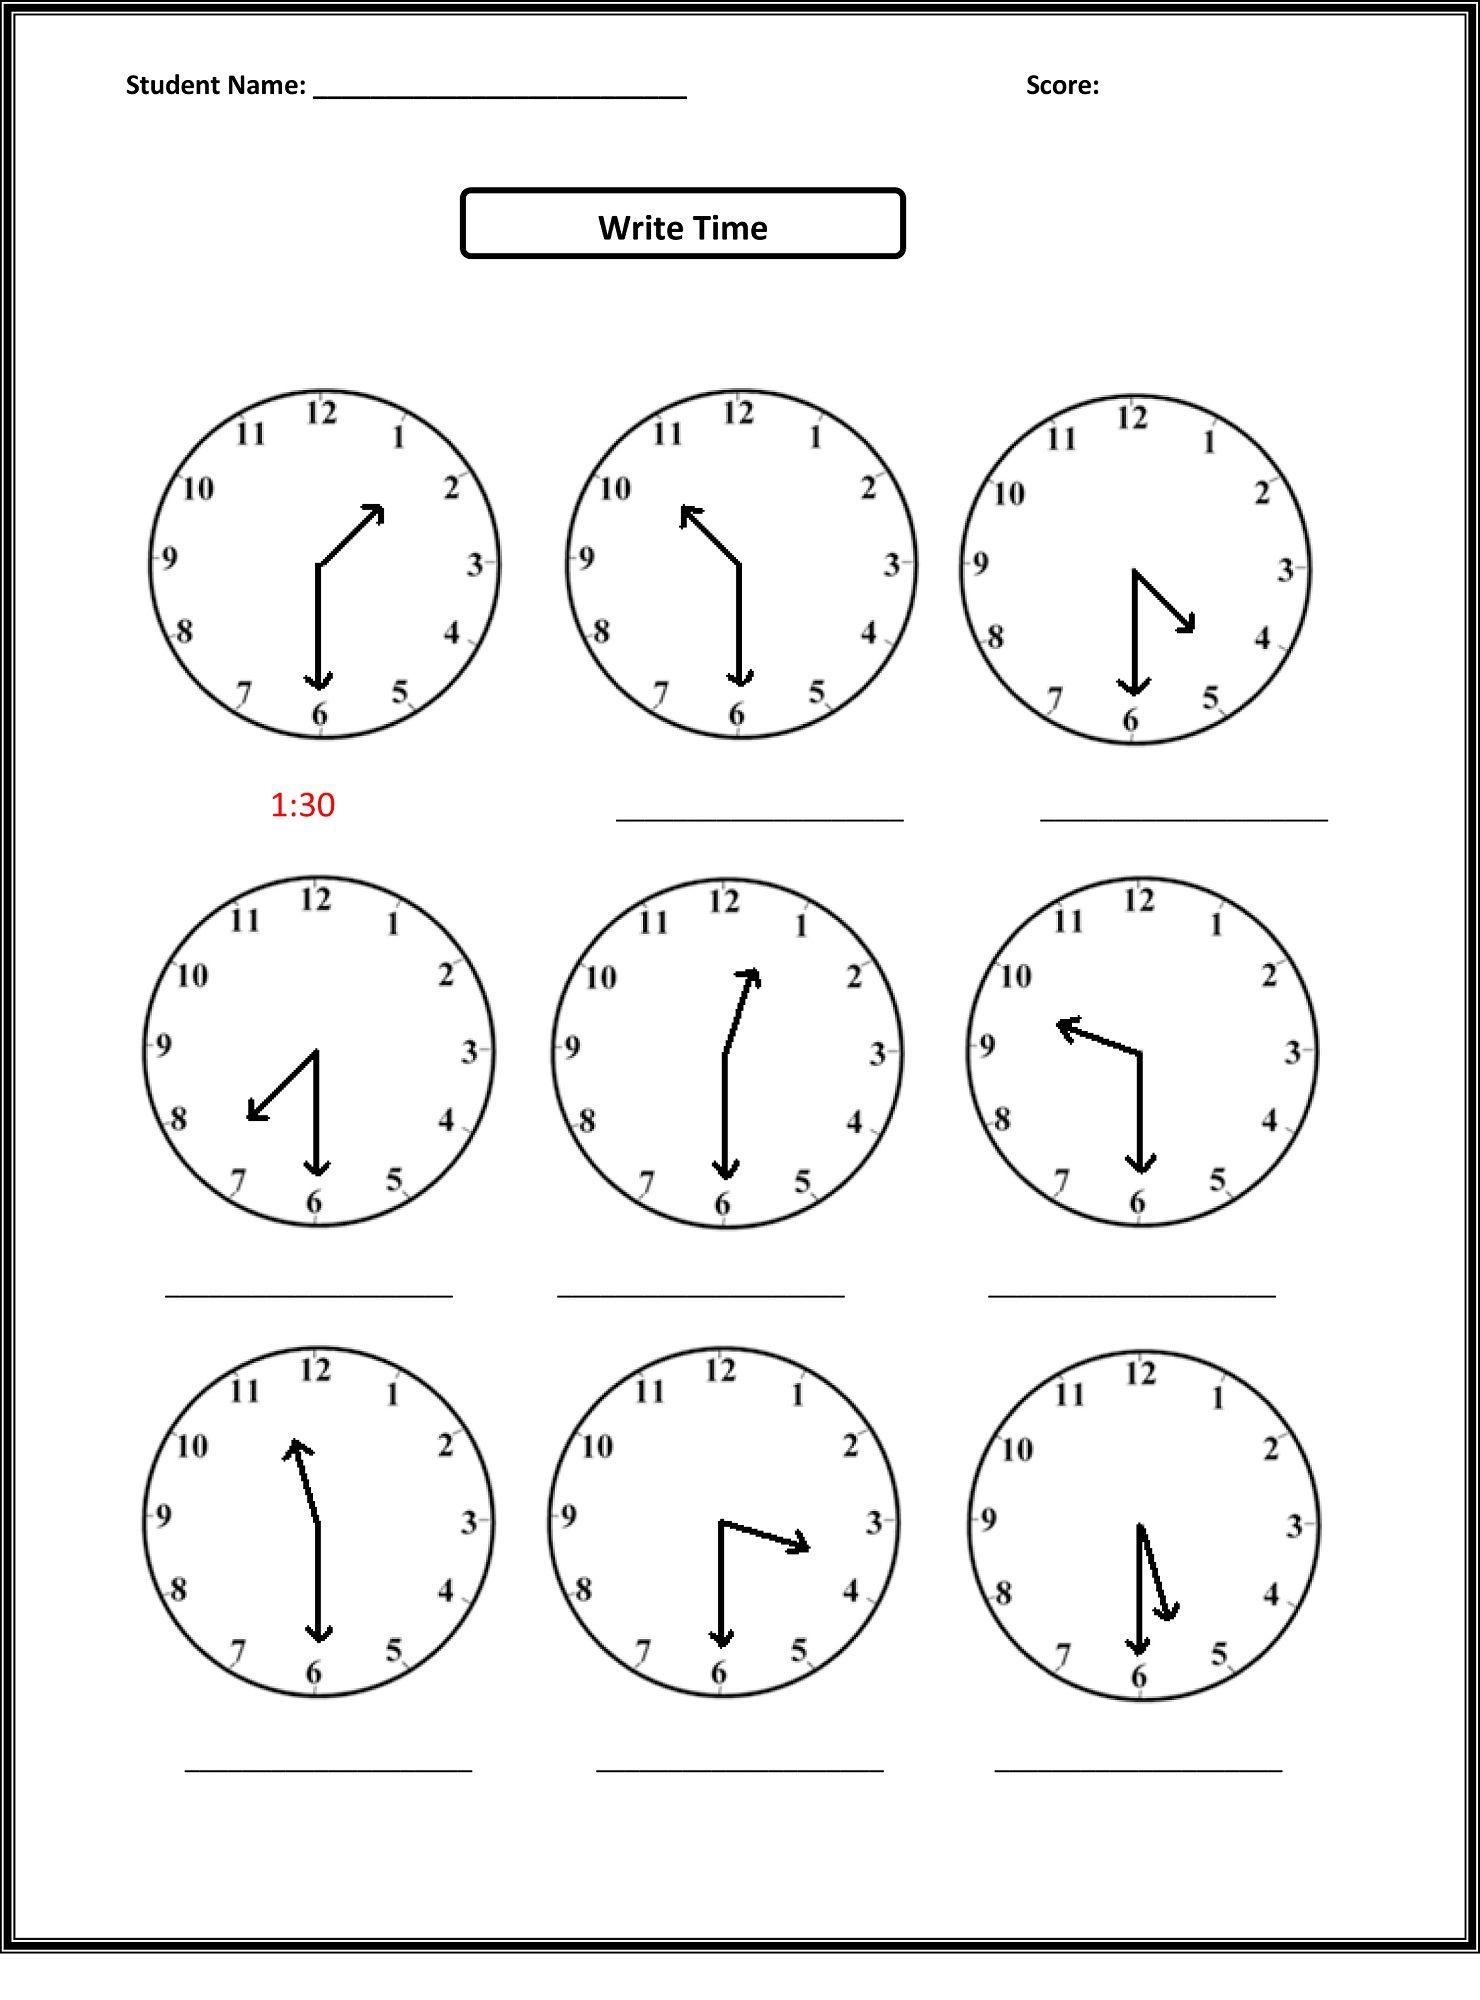 worksheet Simple Elapsed Time Worksheets time elapsed worksheets to print activity shelter kids shelter